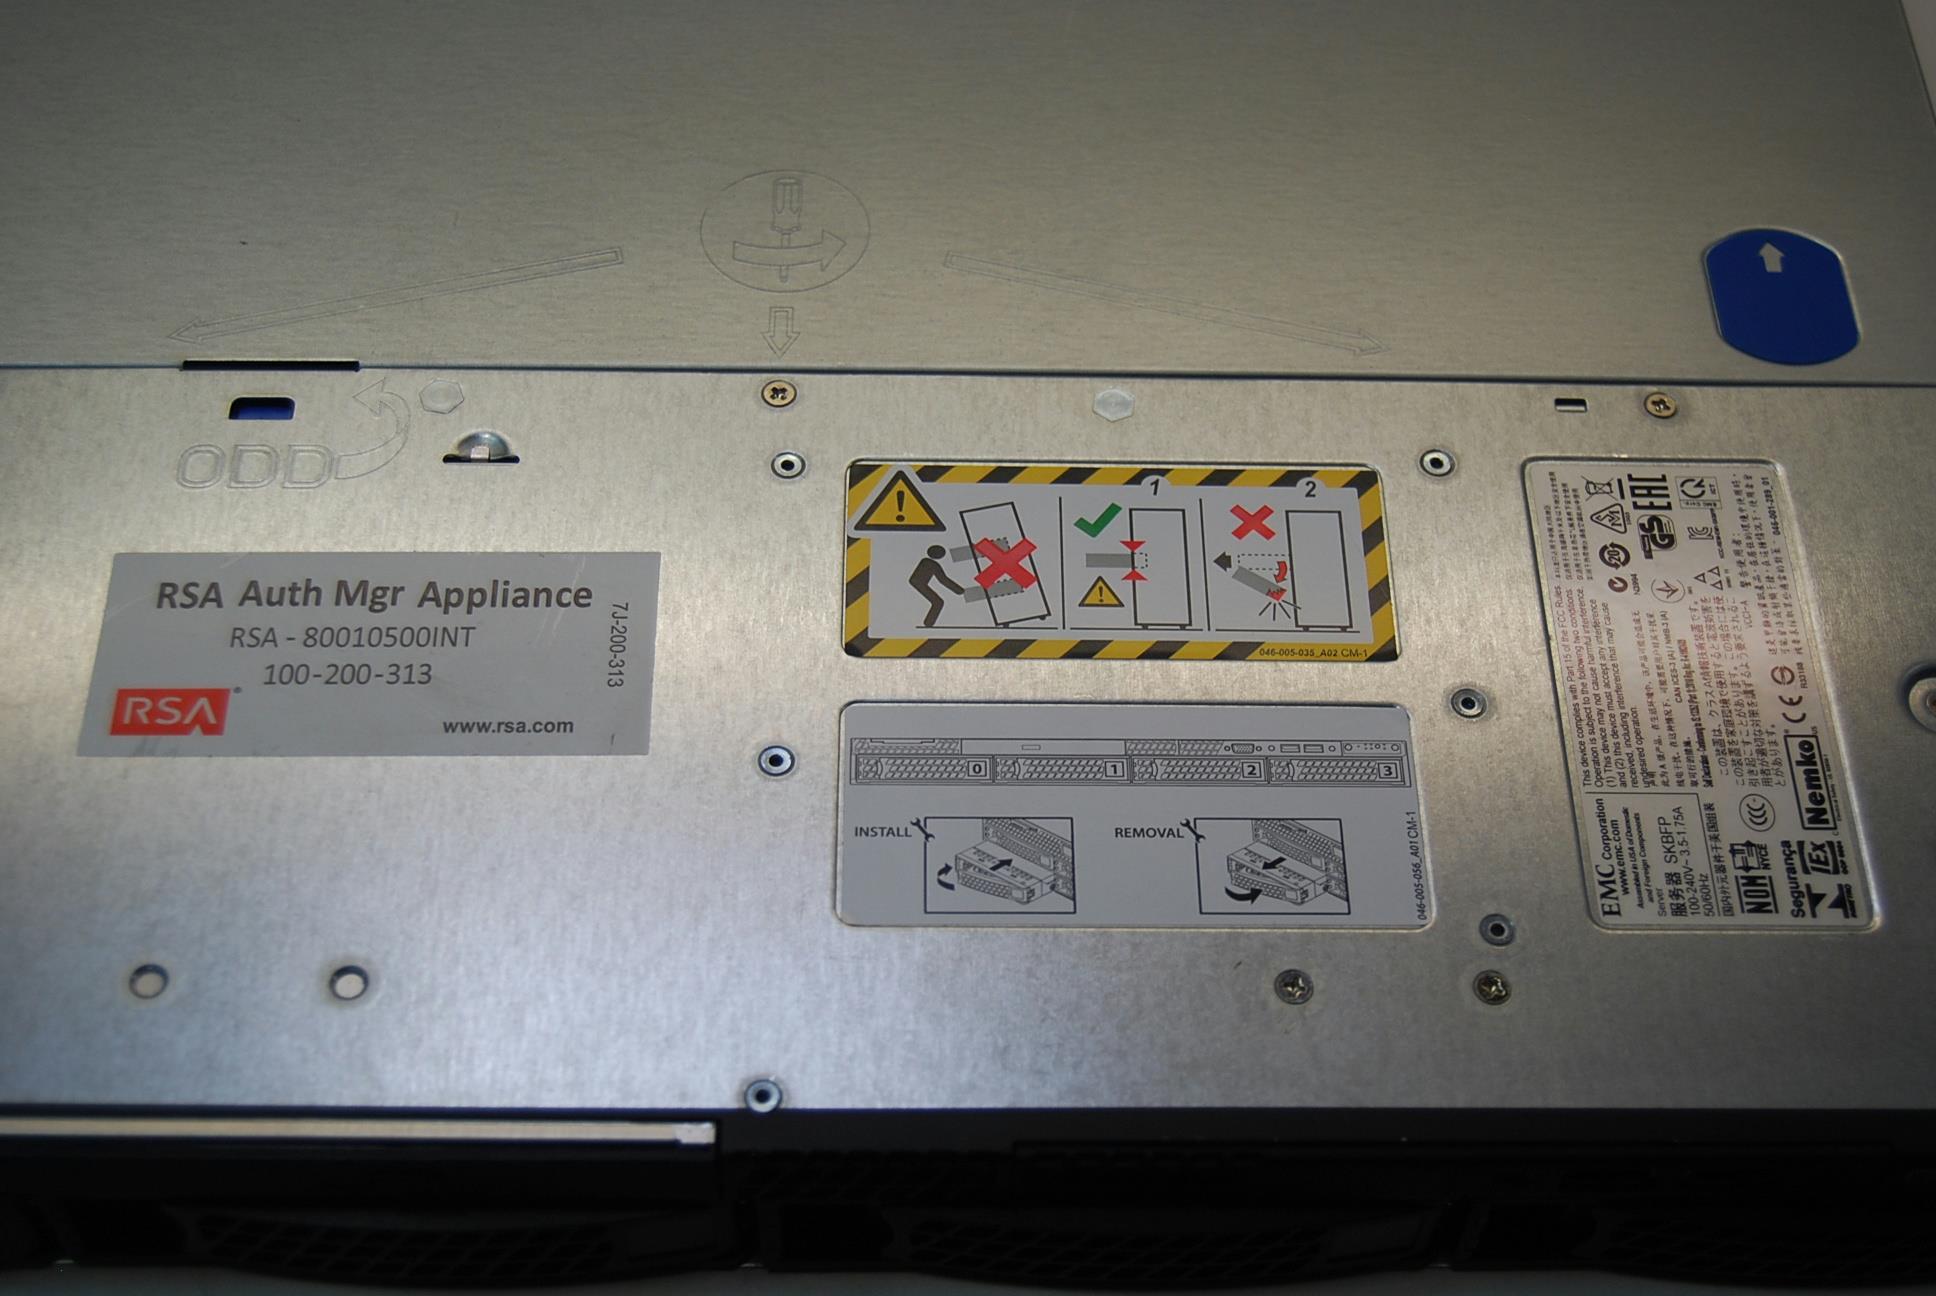 rsa securid appliance 130 manual